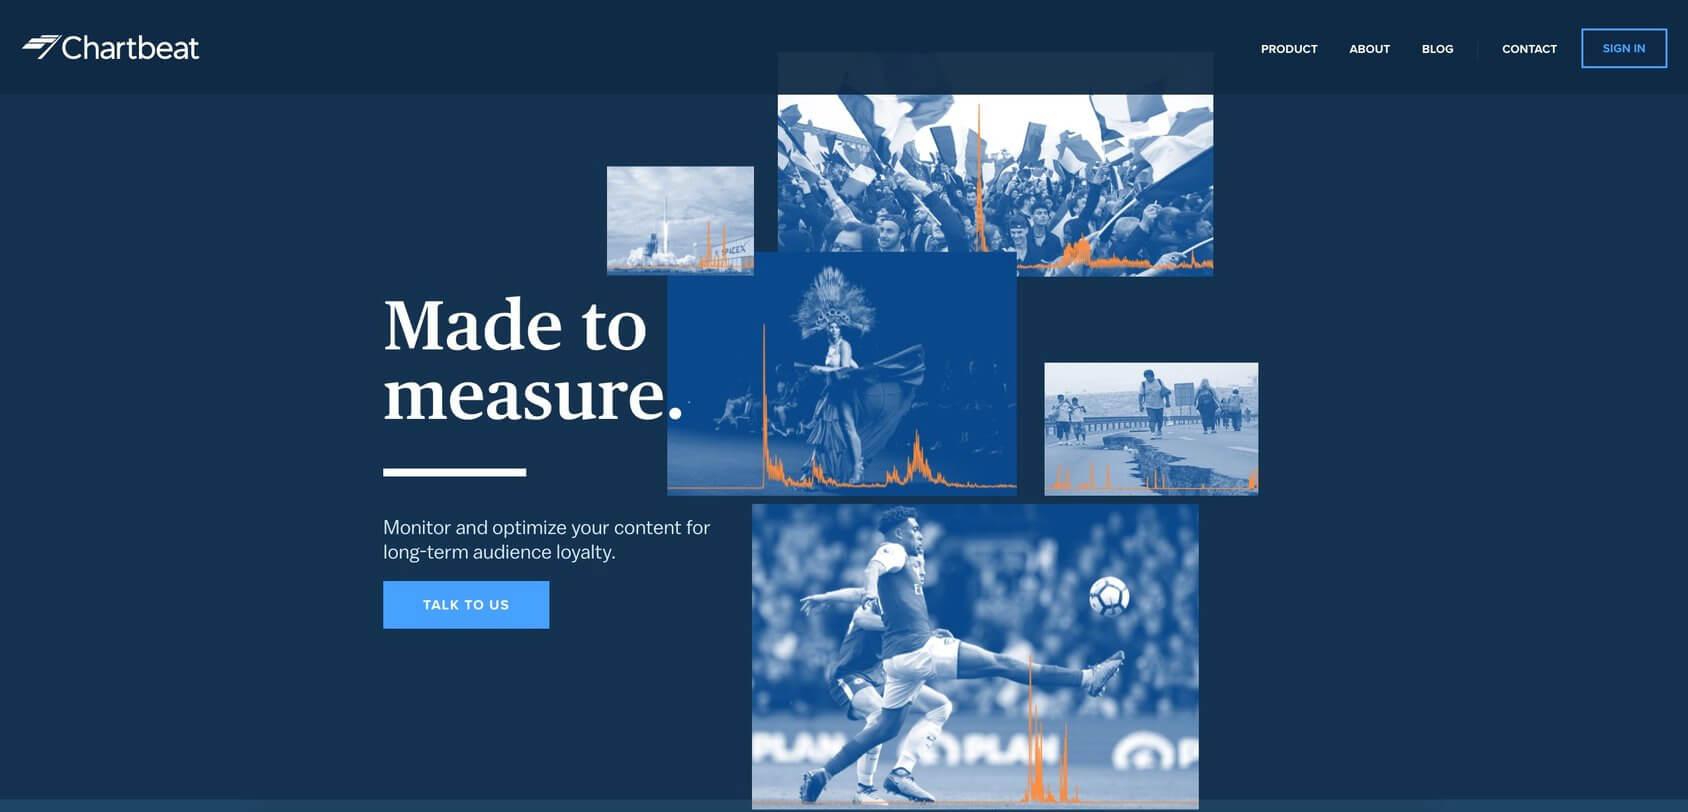 Chartbeat homepage